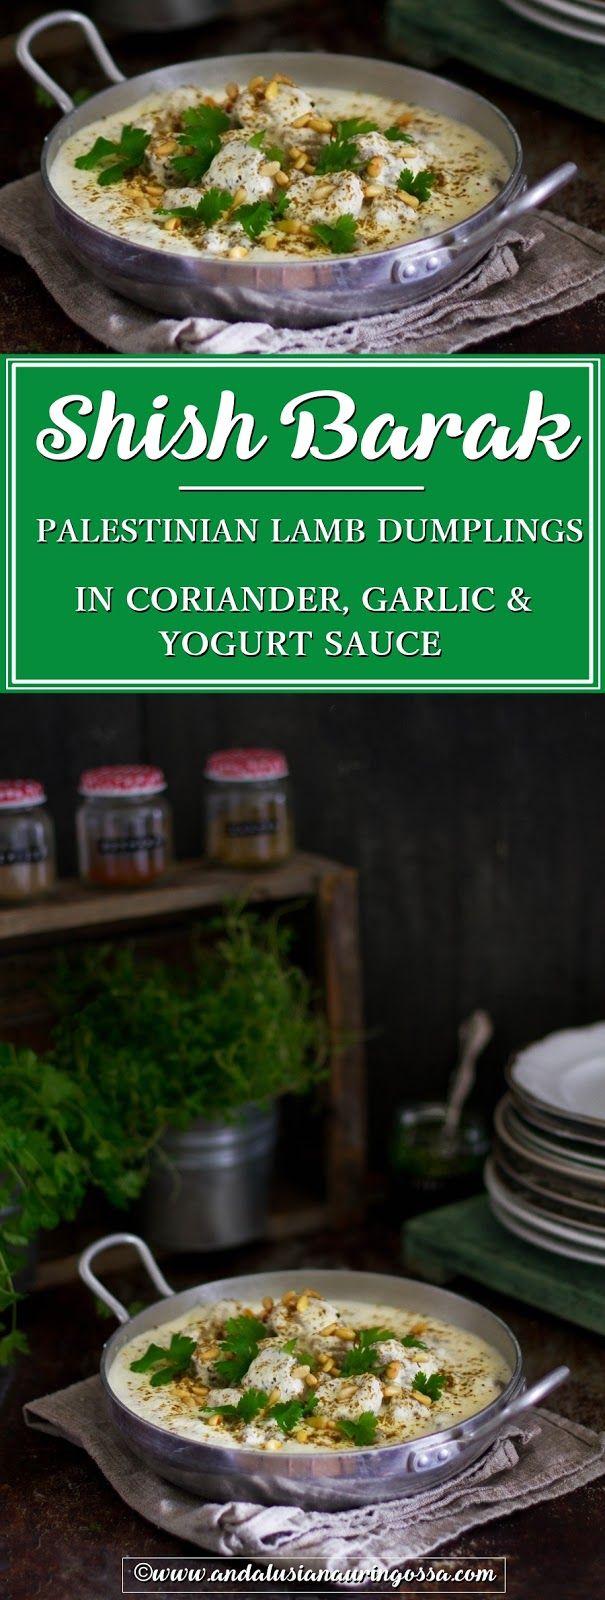 Shish Barak, lamb dumplings in coriander, garlic and yogurt sauce is one of my fondest Palestinian food memories. Here's my recipe (and it is yummy!)   * * *   food blog food photography comfort food Palestinian food Palestinian kitchen Middle Eastern foo